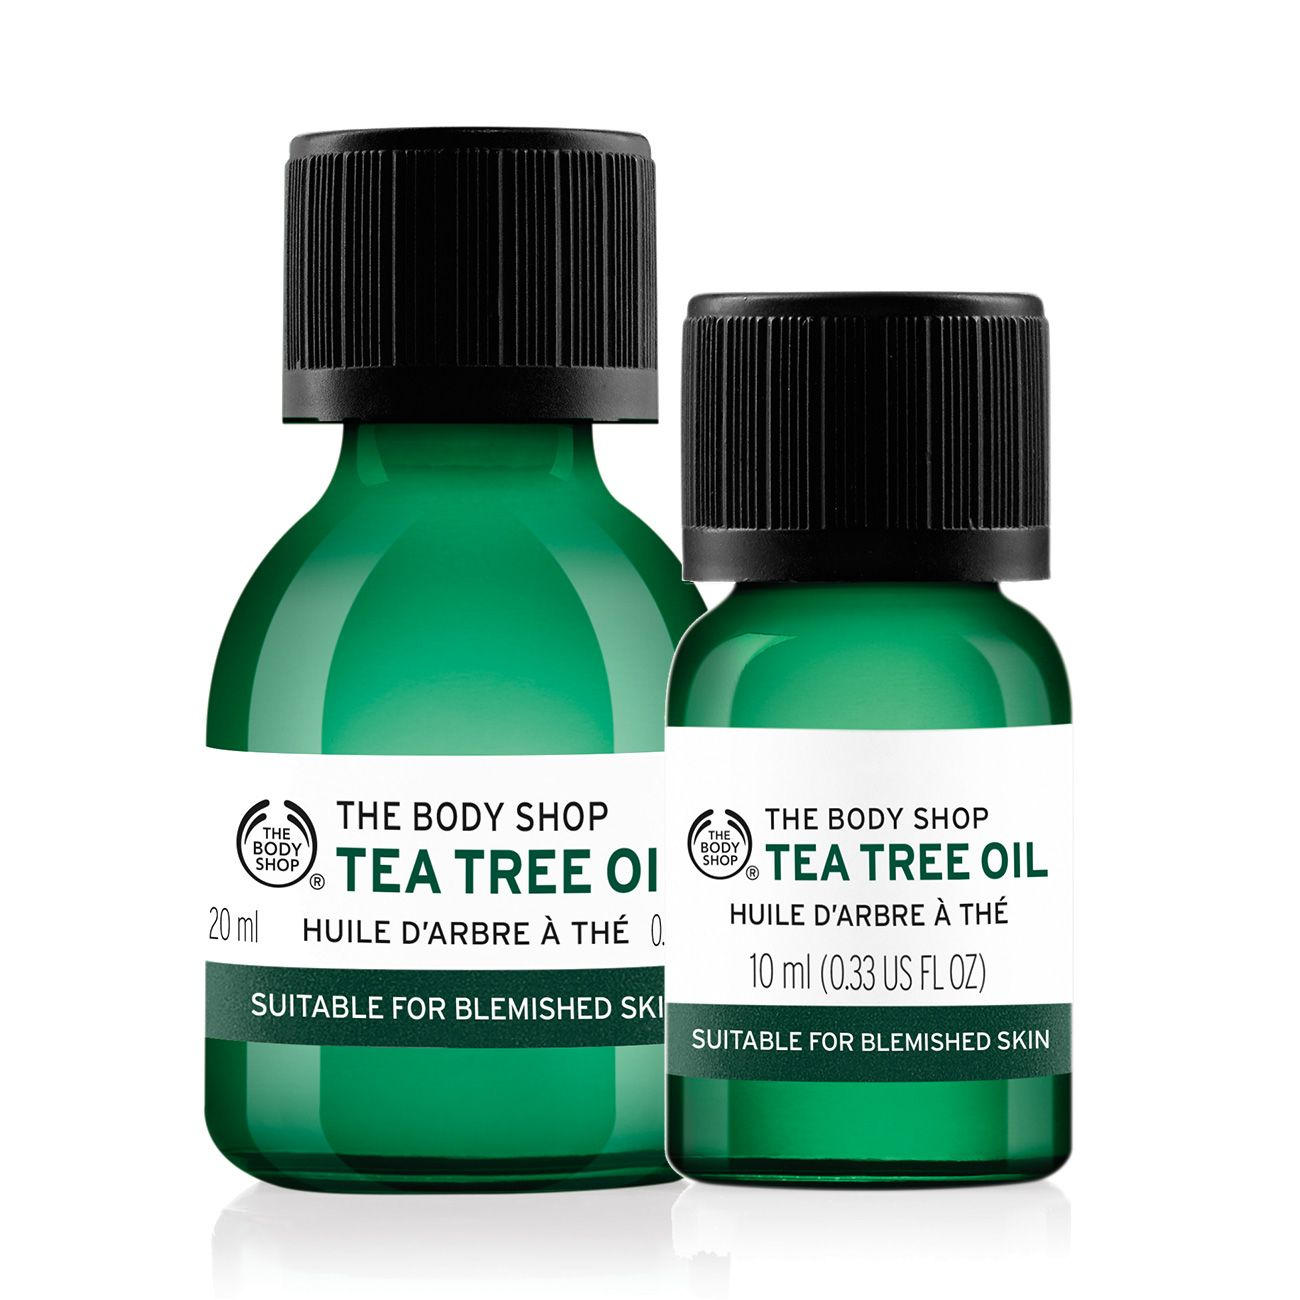 The Body Shop Mobile Natural Acne Remedies Acne Remedies Body Shop Tea Tree